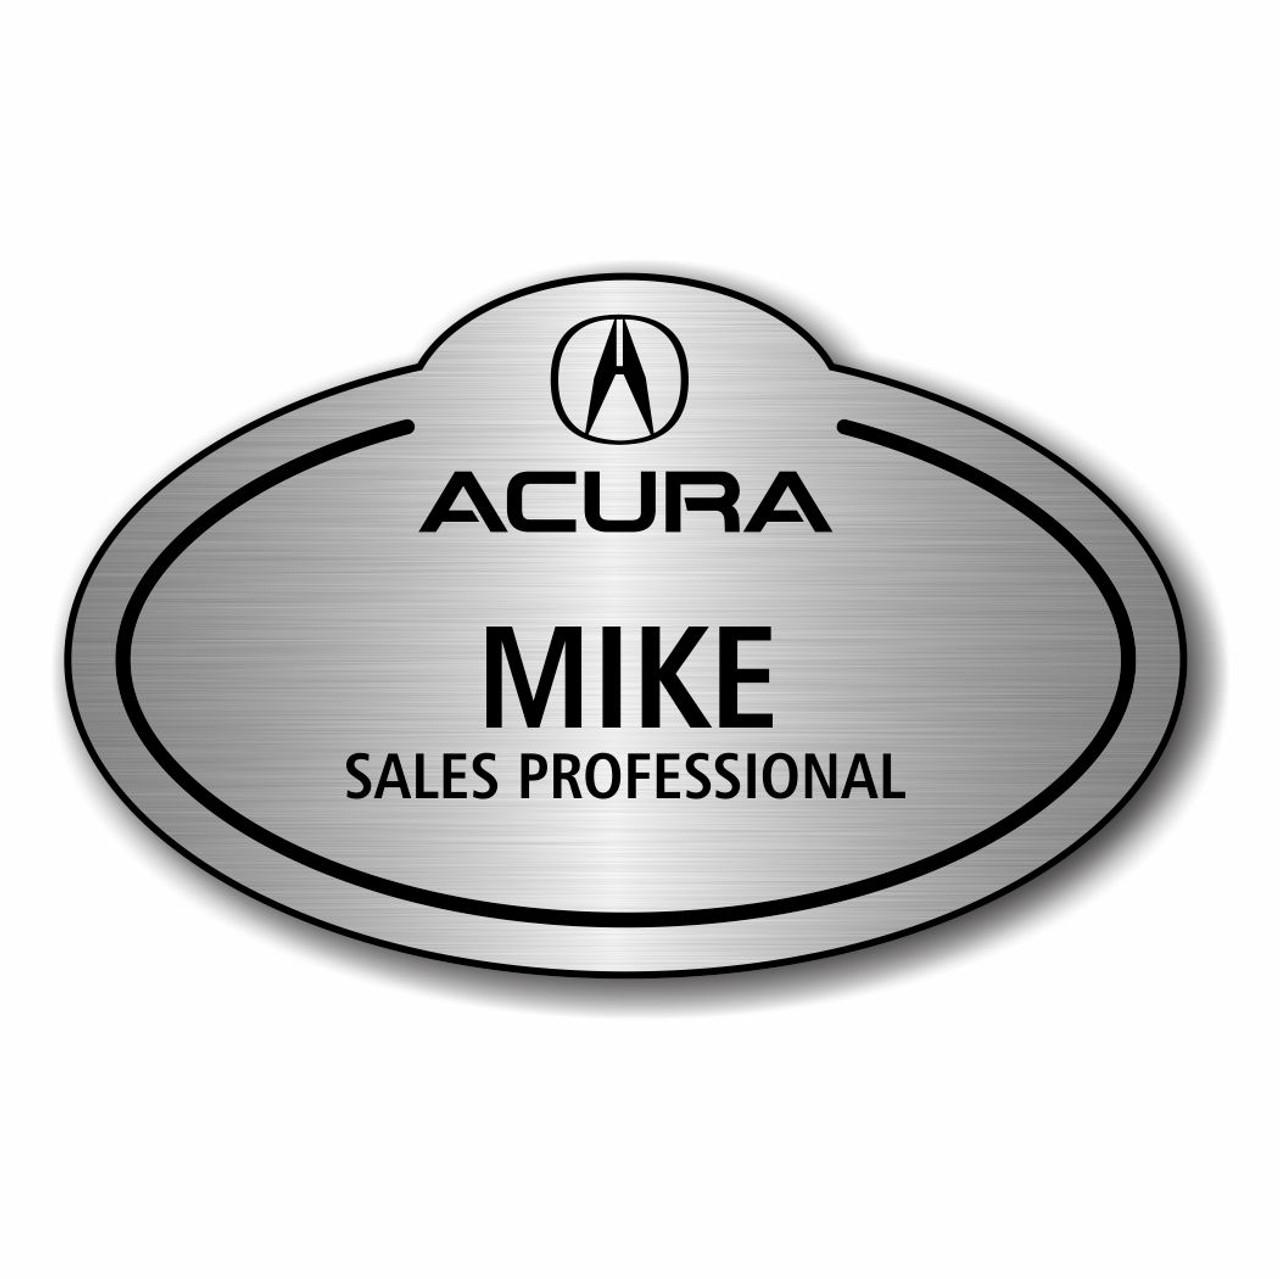 Acura Bubble Top Brushed Aluminum Name Badge - Acura badge